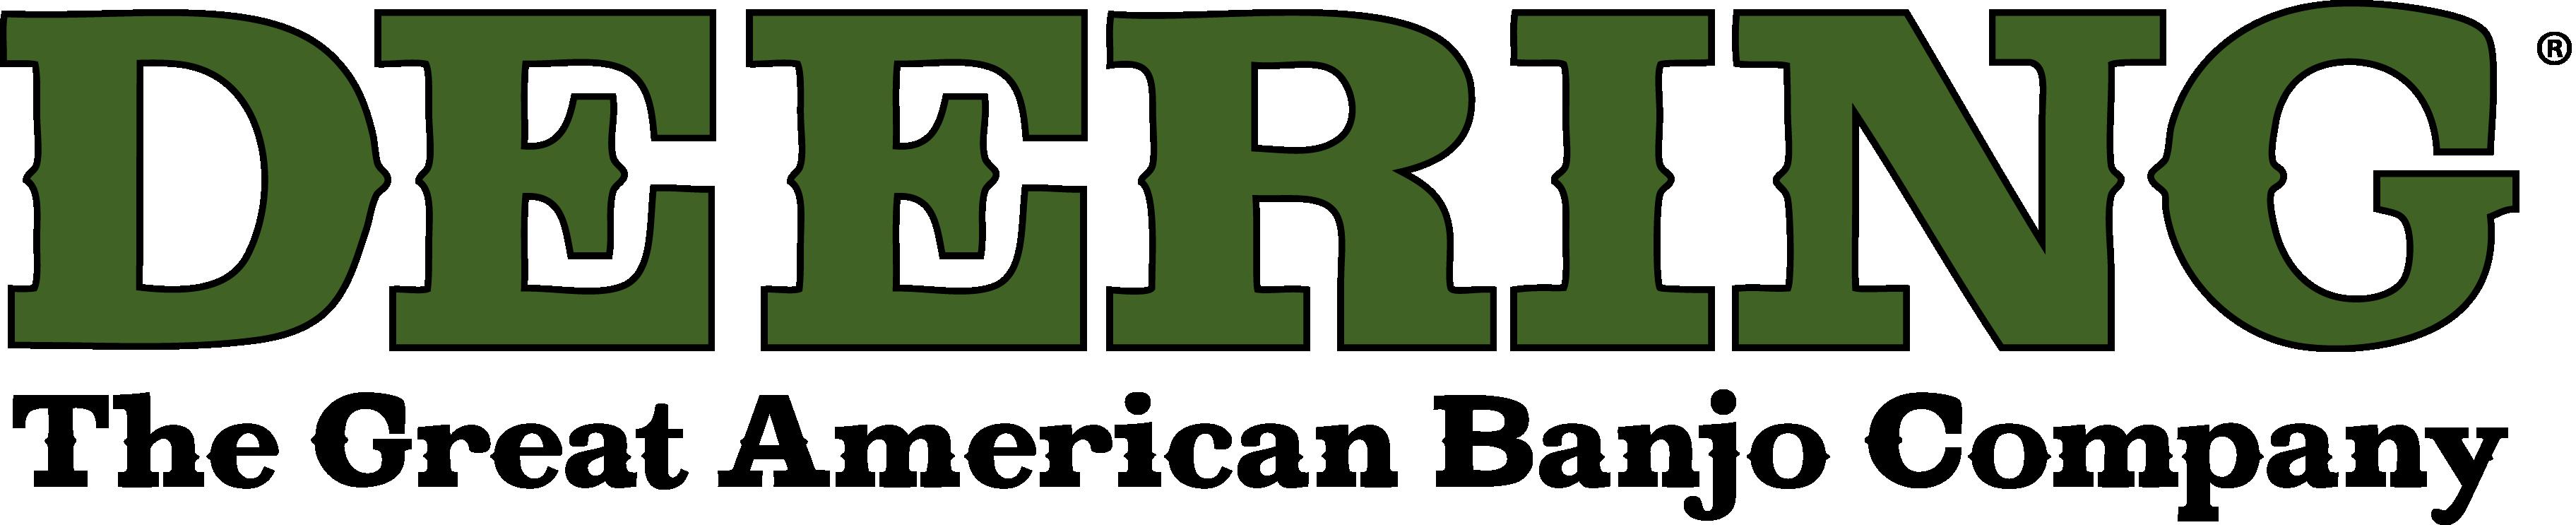 Deering Banjo Company - The Great American Banjo Company